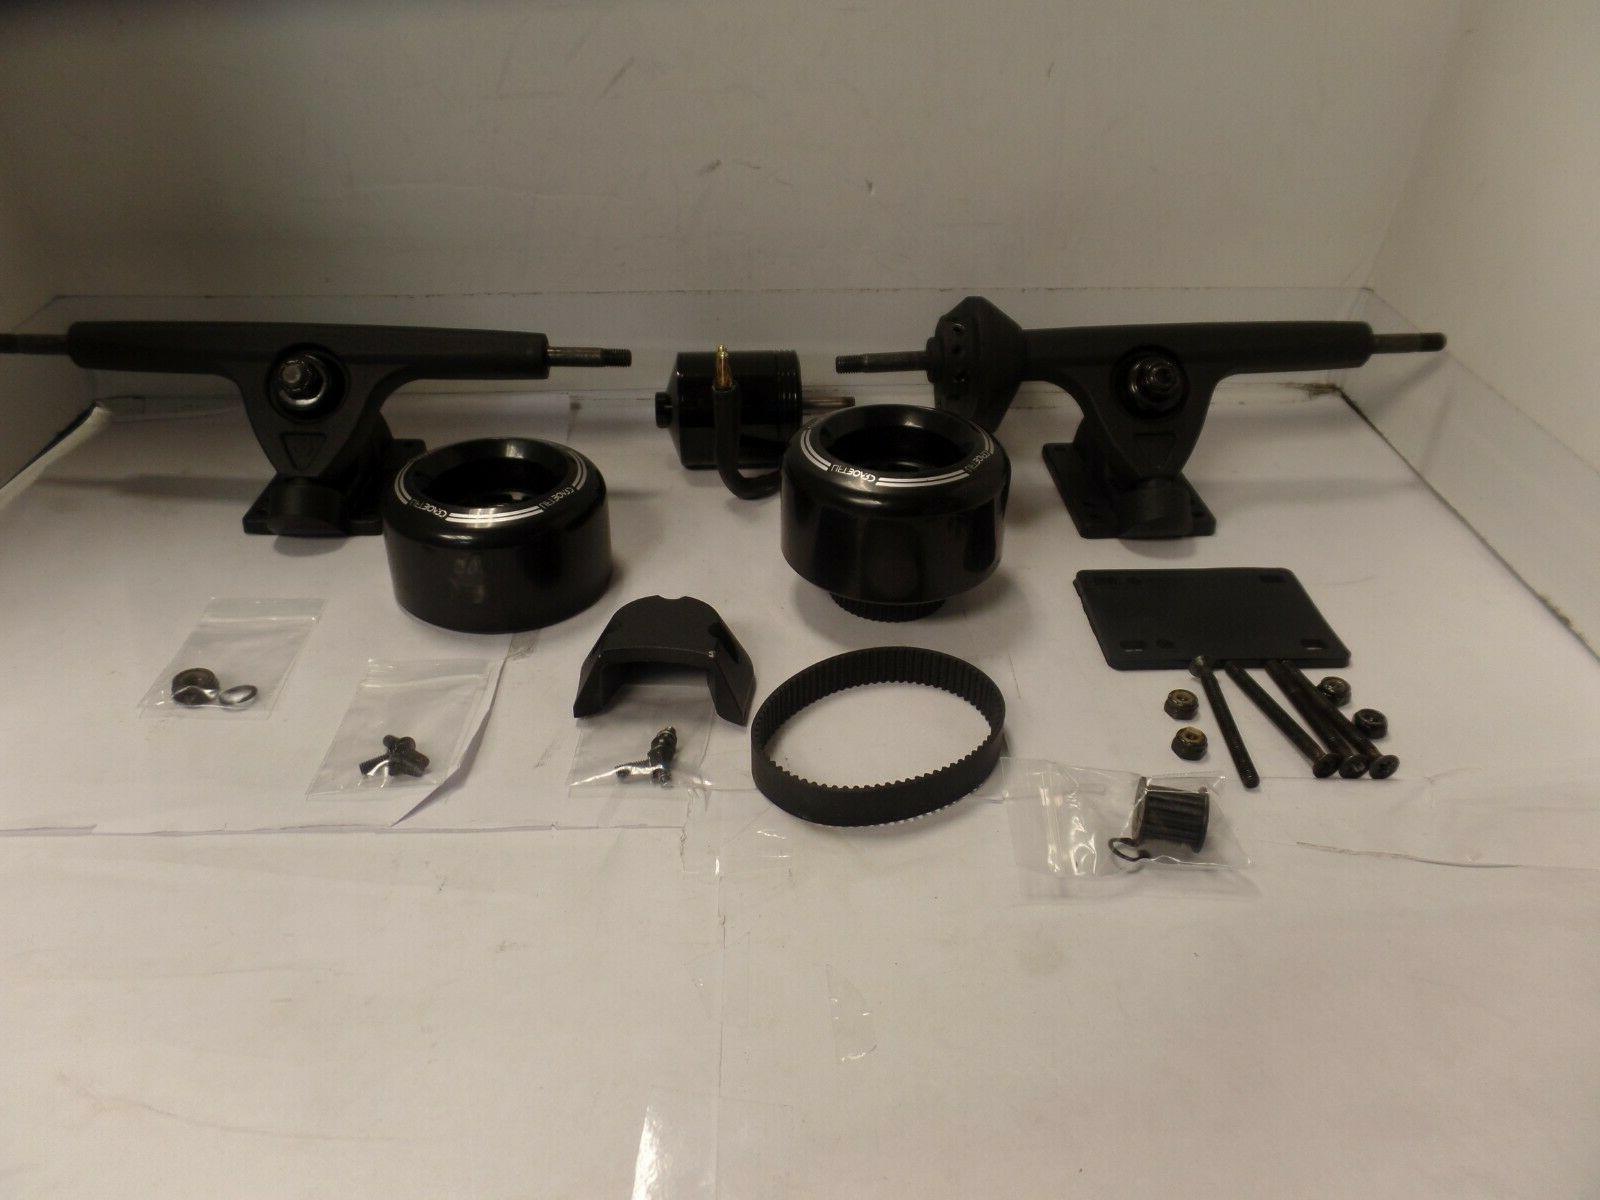 Genuine OEM Parts Wheel/Gear/Trucks/Axel/Screw/etc